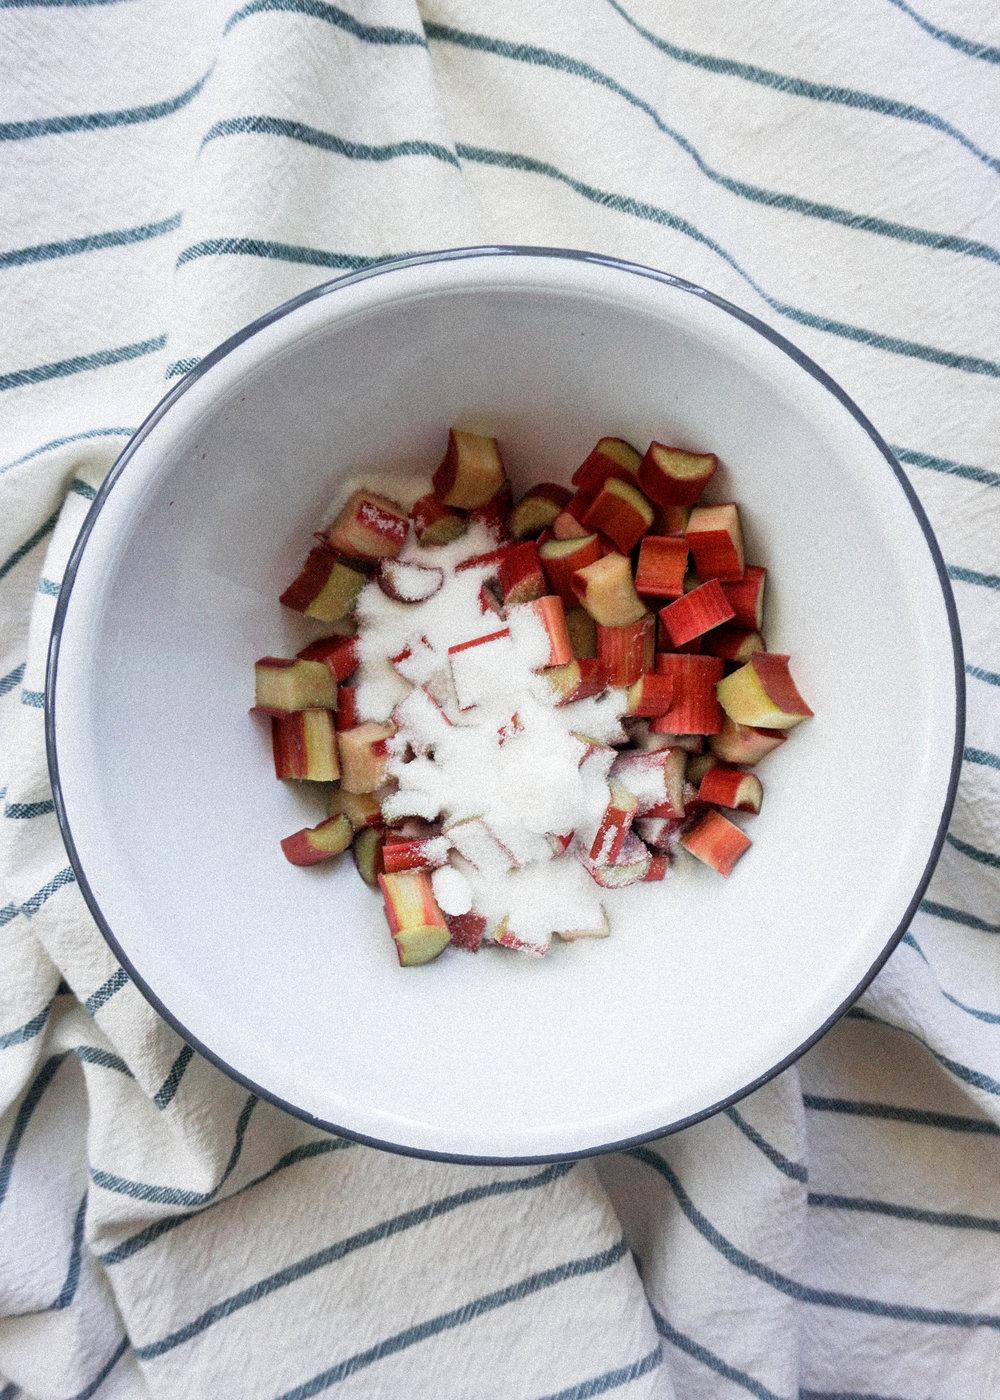 Mini Rhubarb Crepe Cake